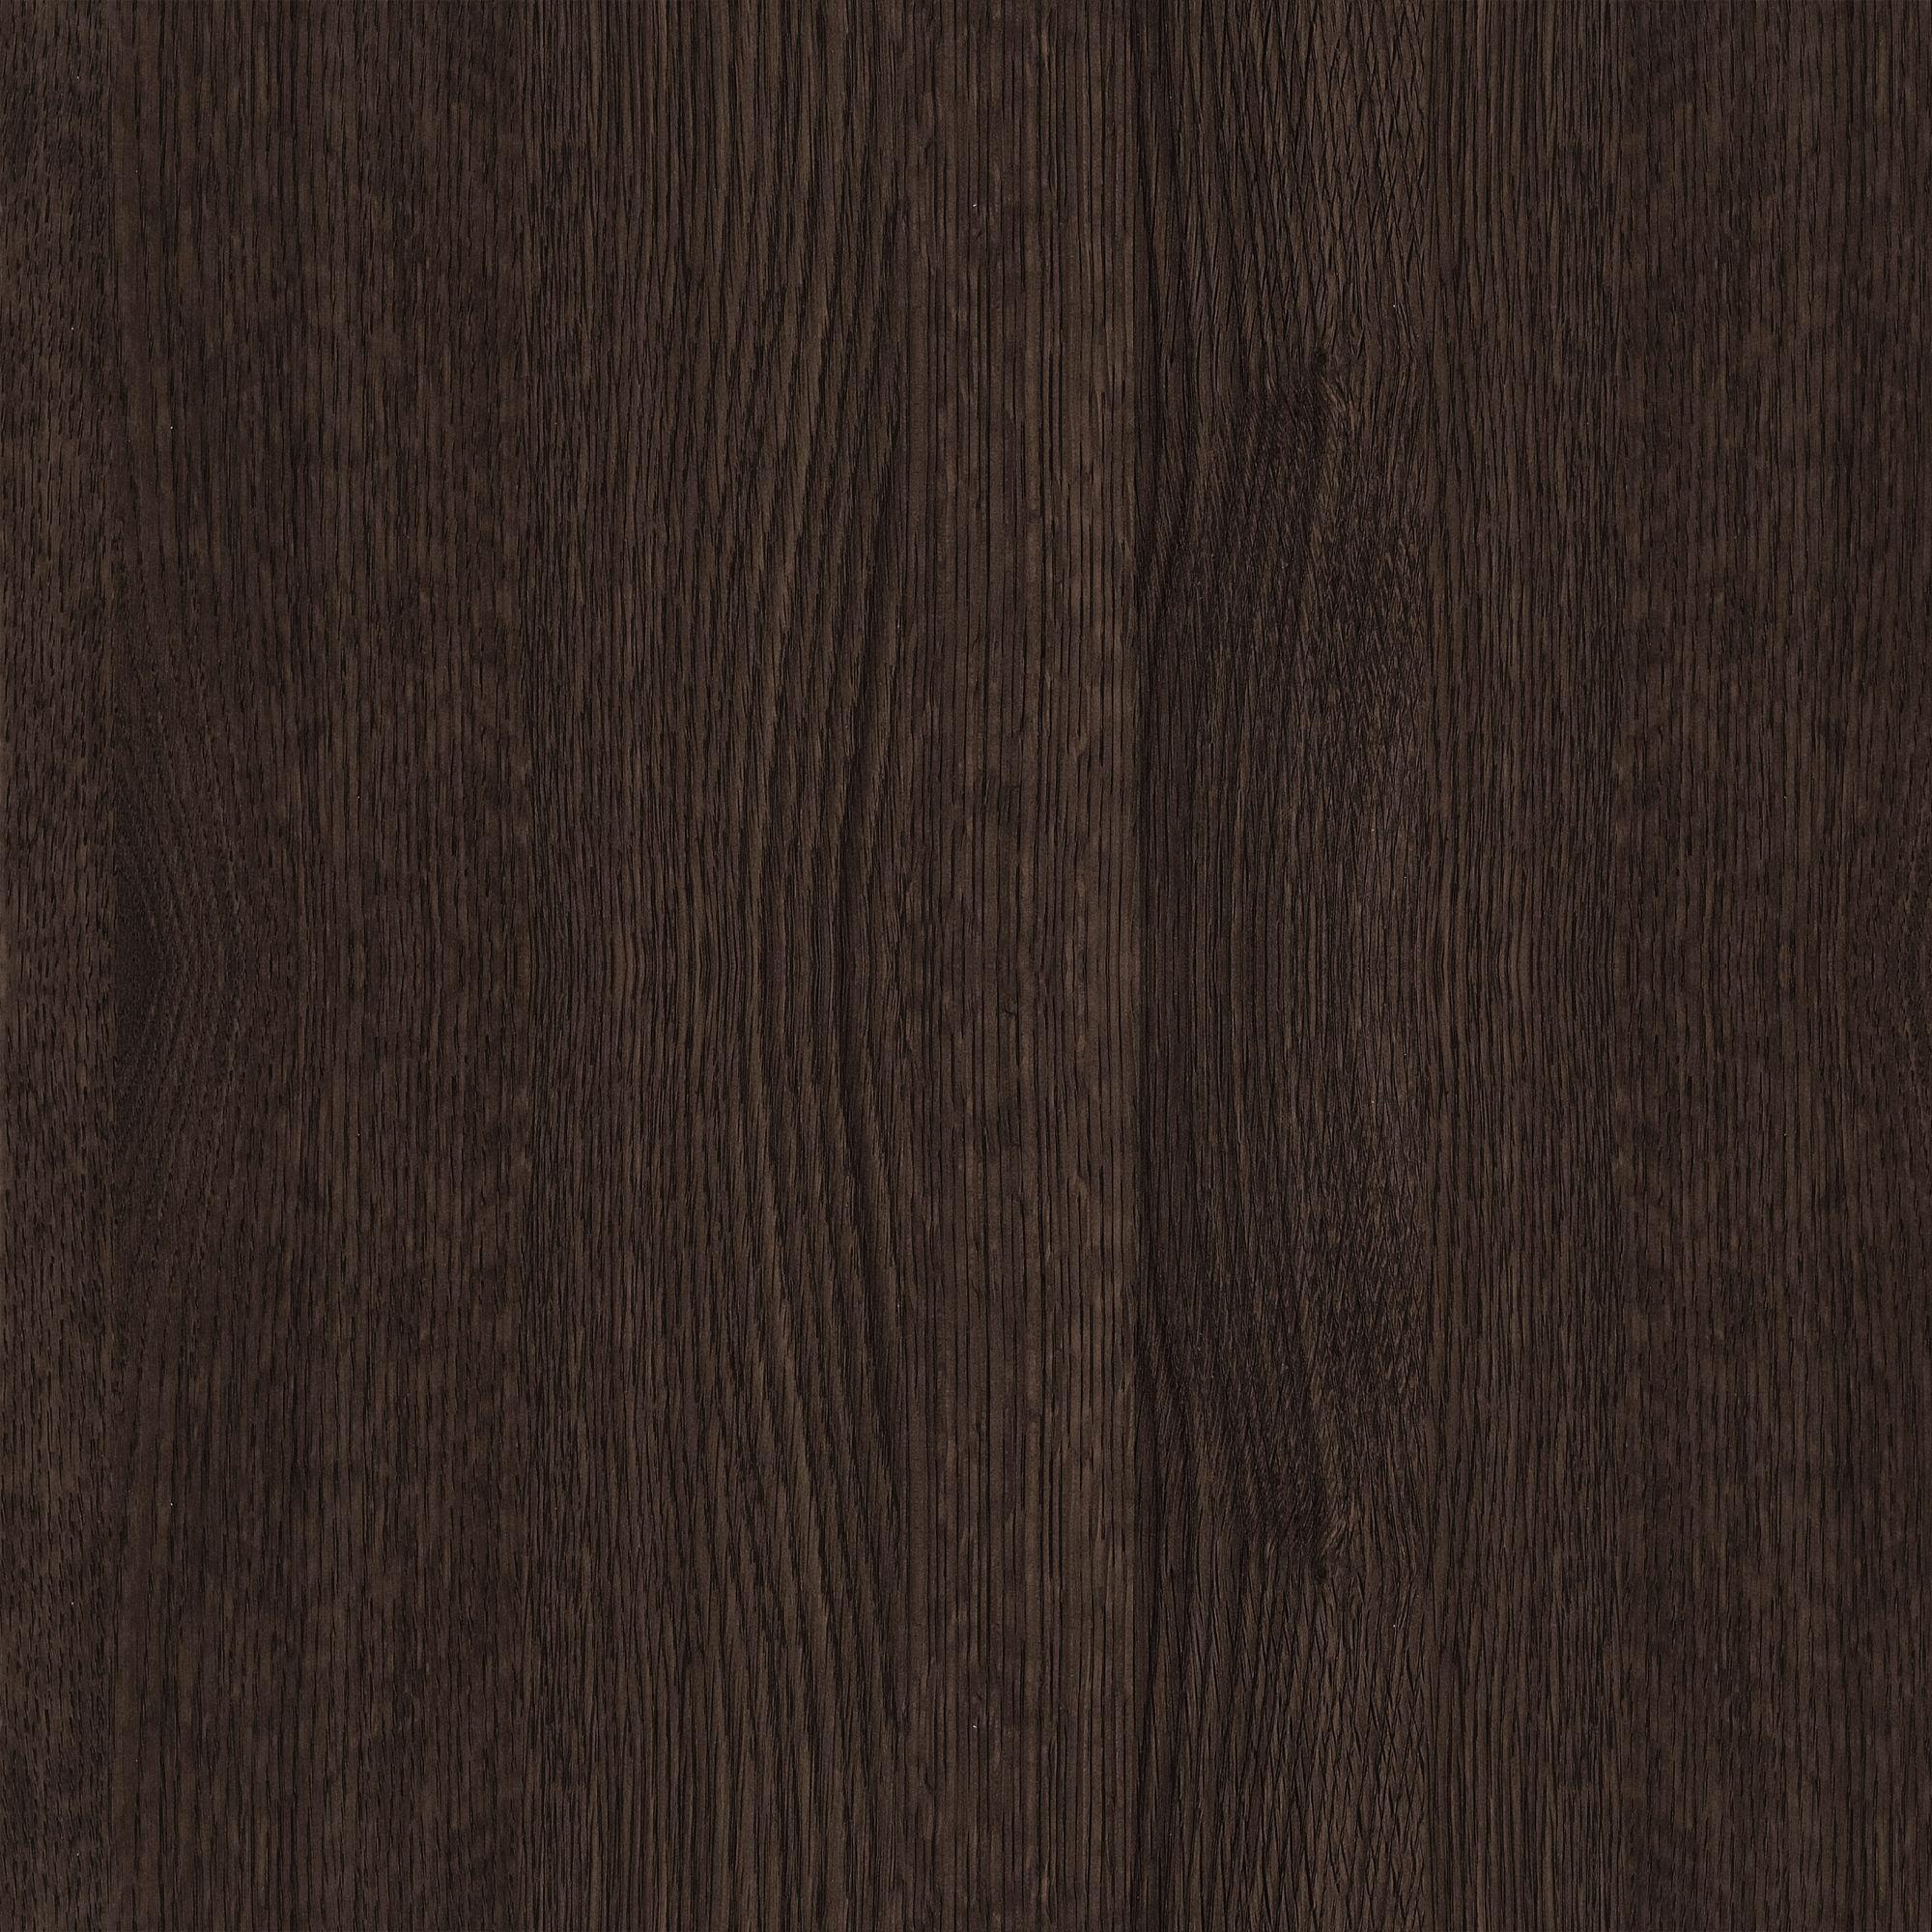 Slash Les Paul Guitar Top Hat Wood Texture Seamless Wood